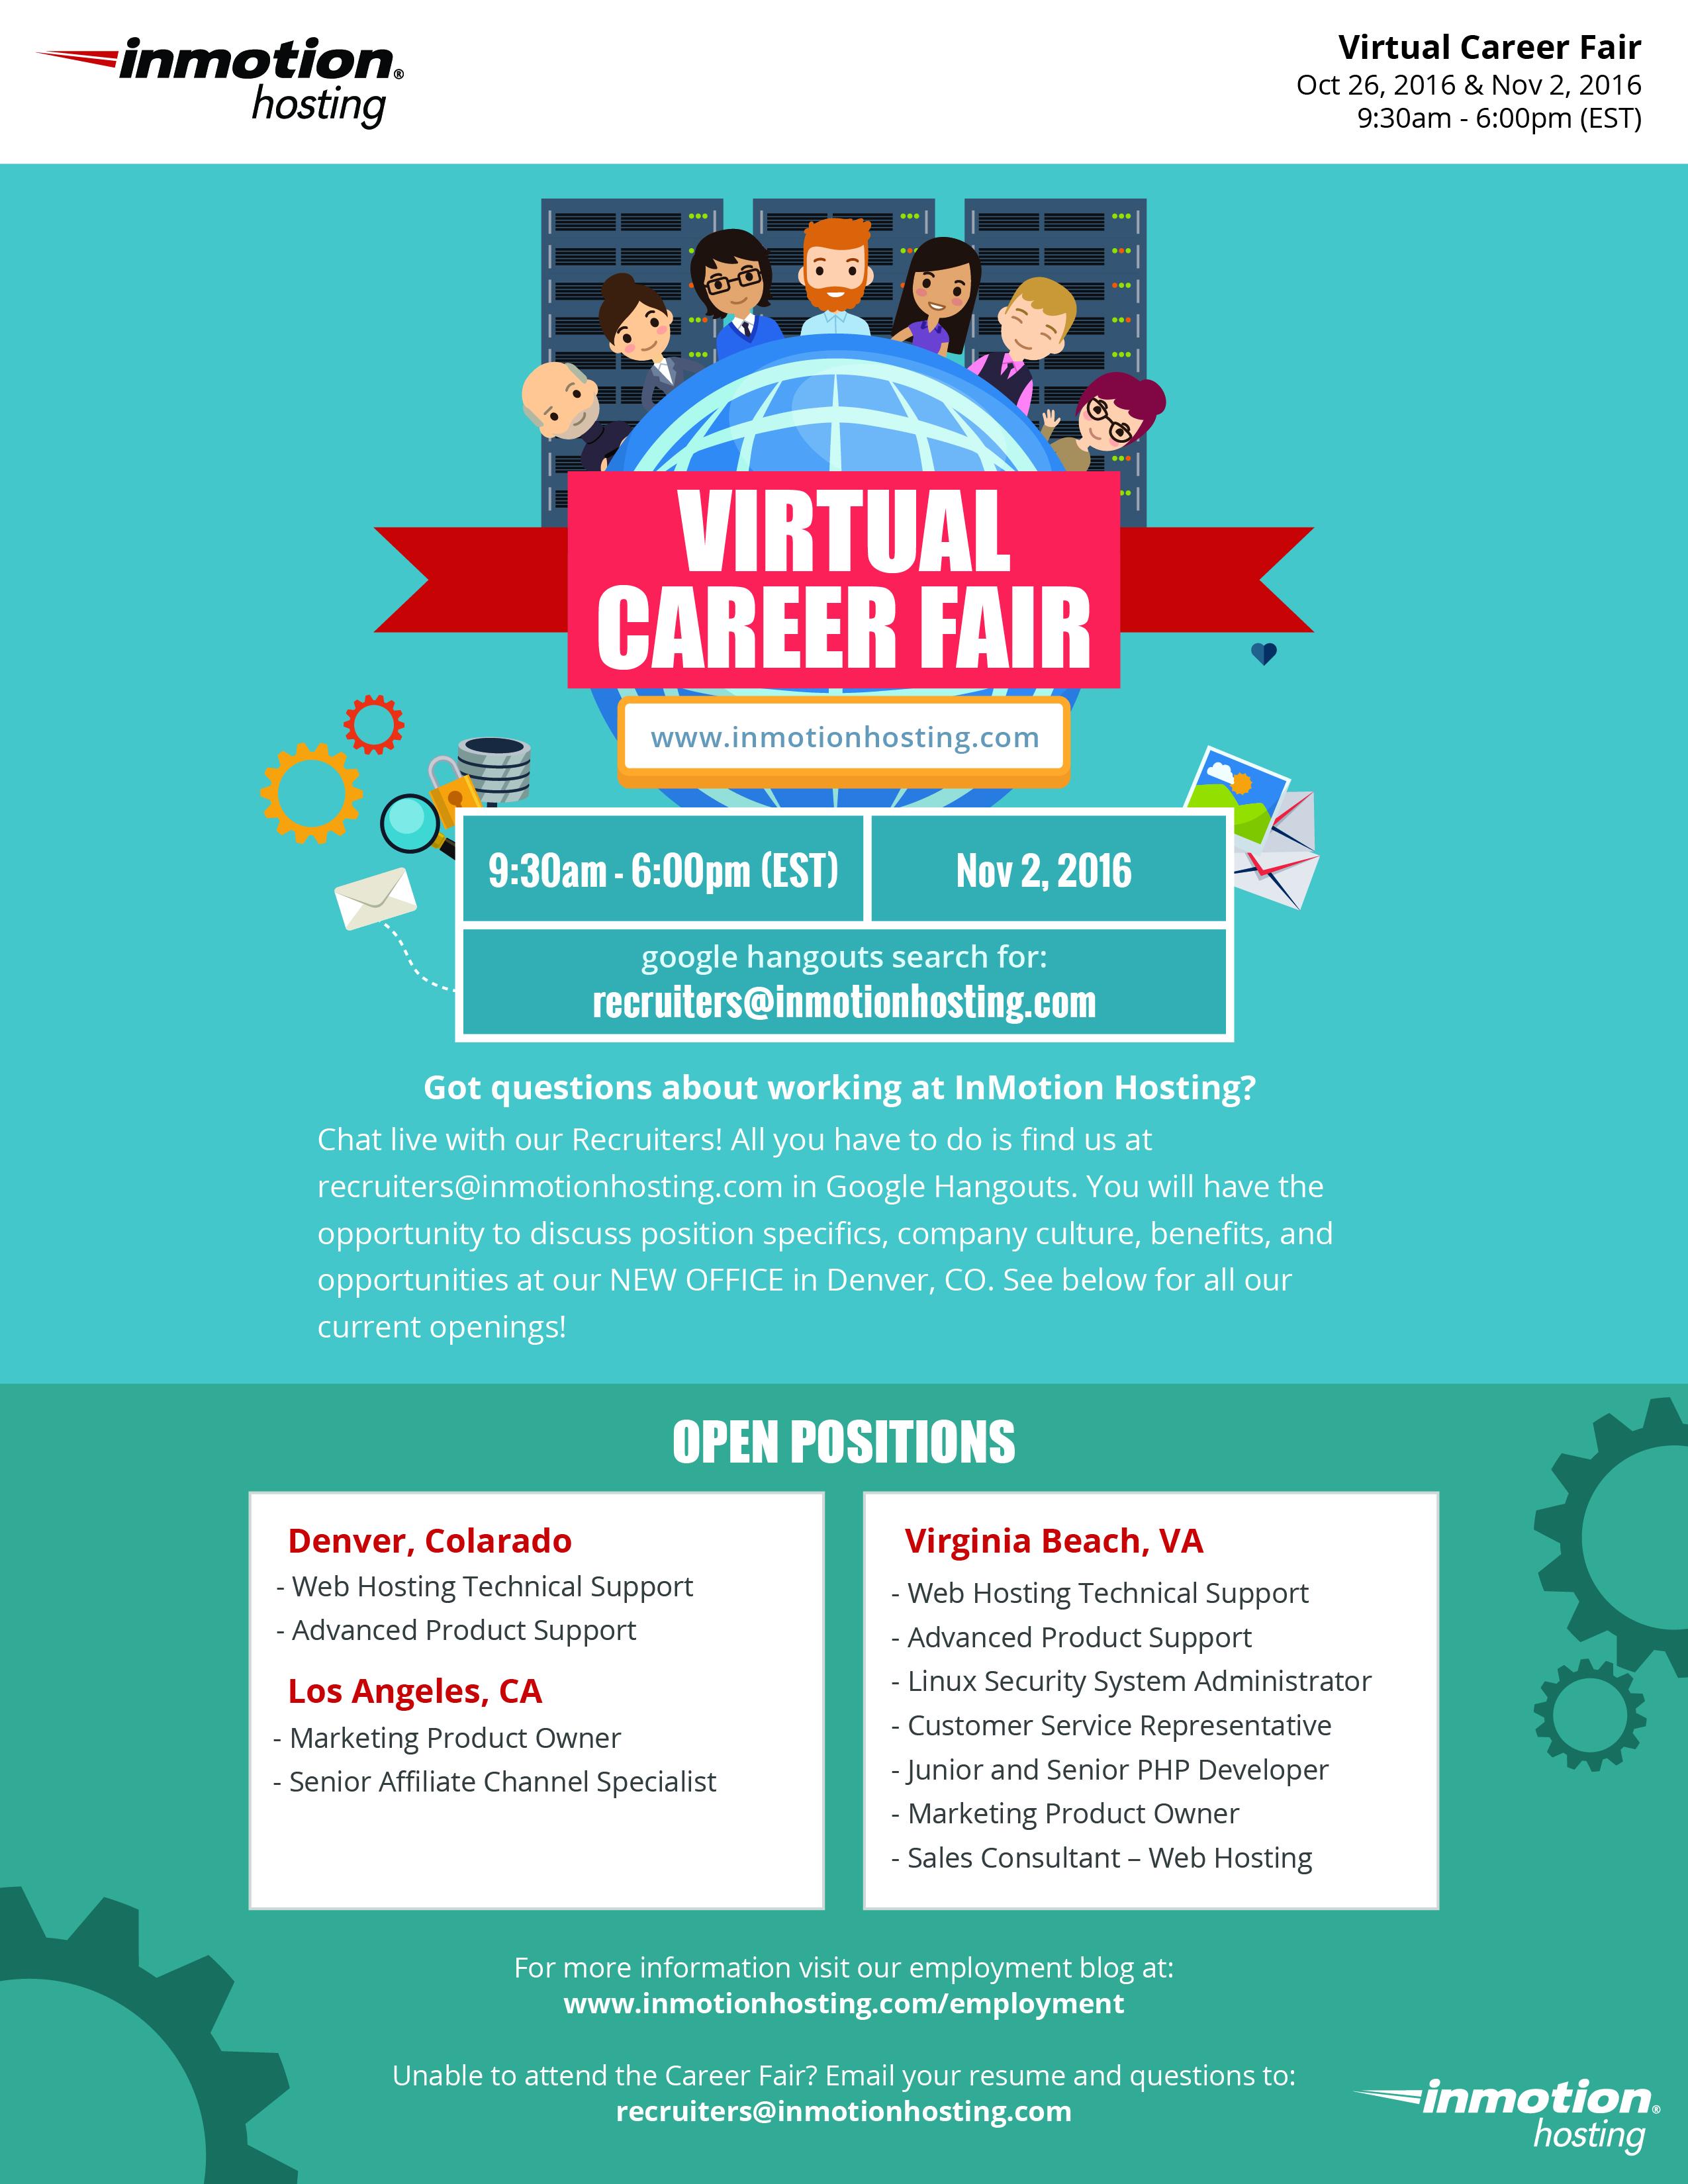 Inmotion Hosting Virtual Career Fair Inside Inmotion Hosting